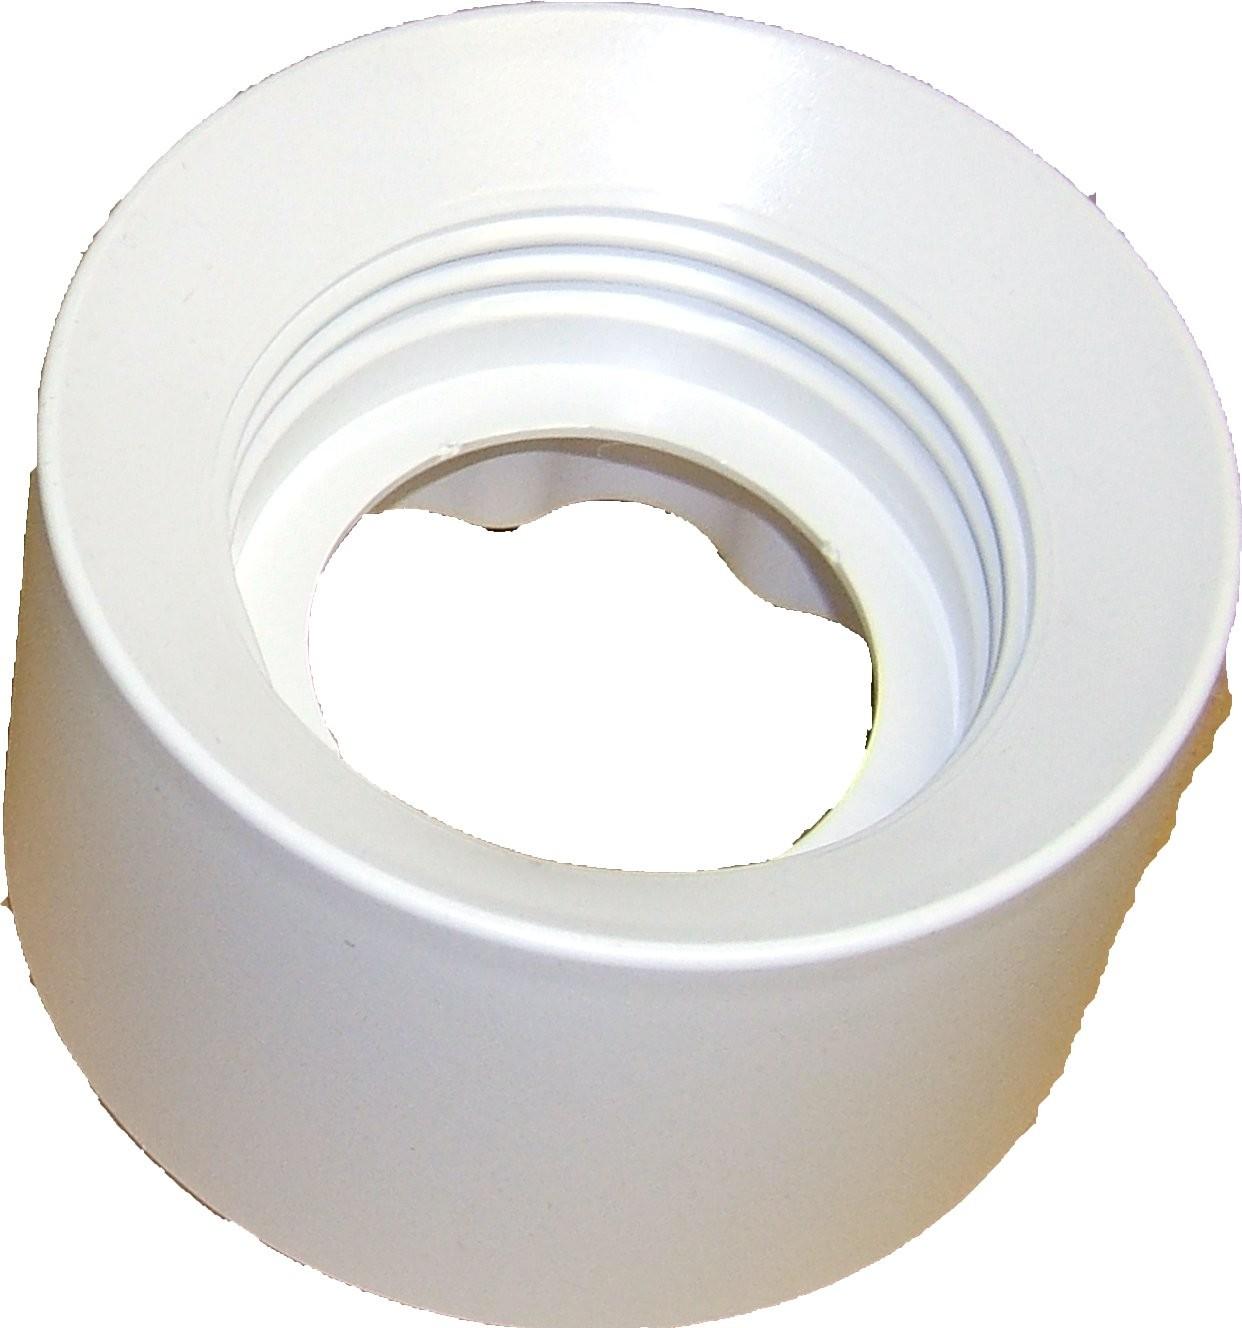 Turmixgép - Gallér fehér